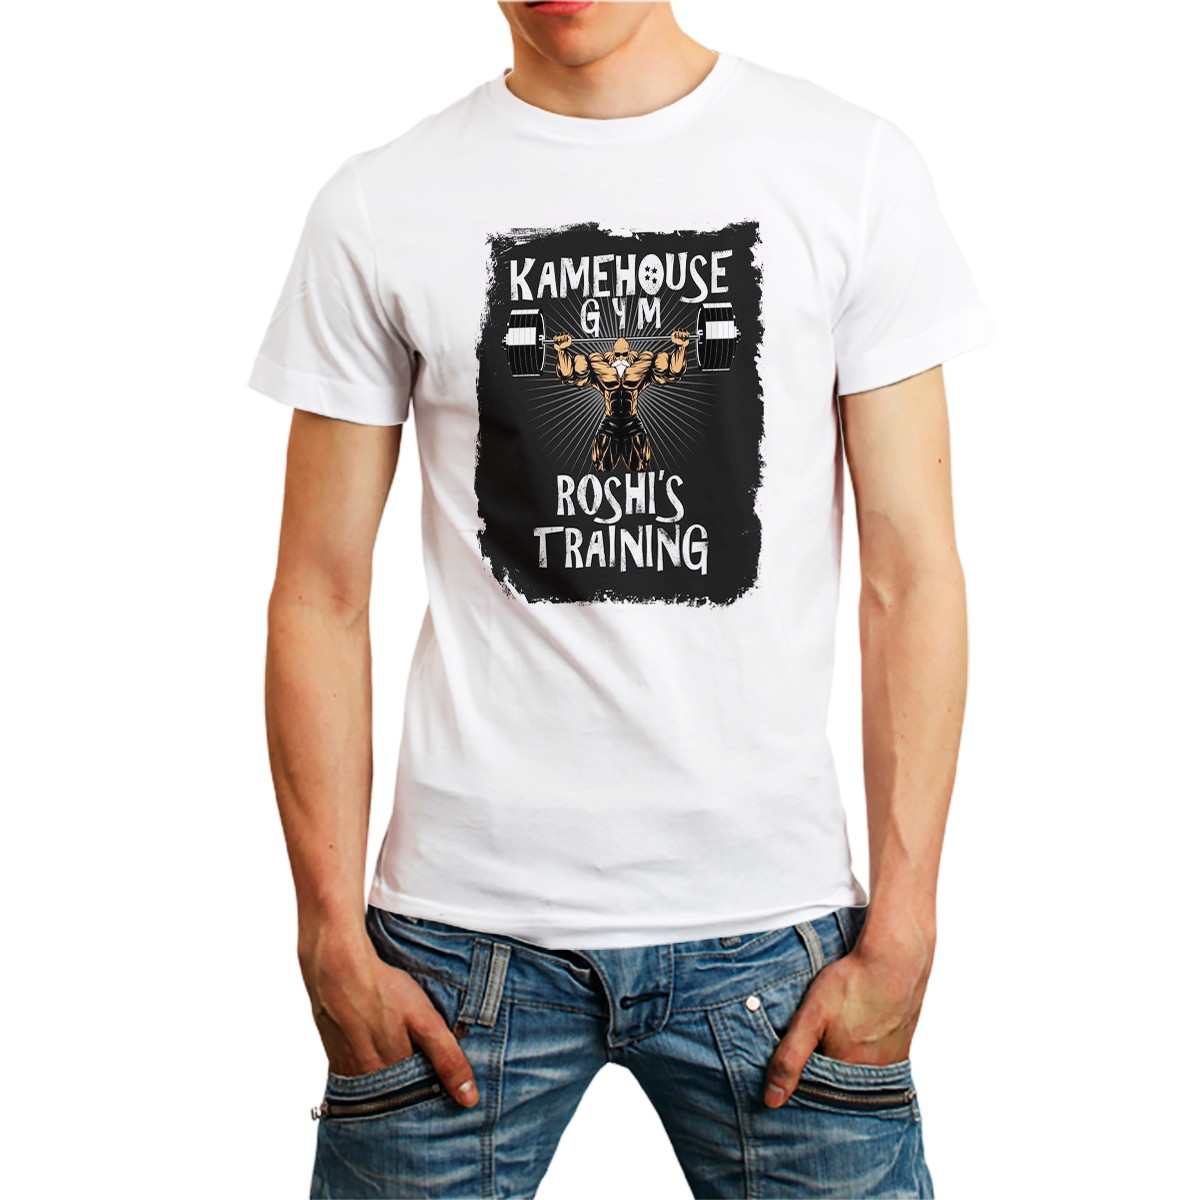 d7002a795c794 Camiseta Academia Fitness Roupa Camisa Masculina Branca no Elo7 ...